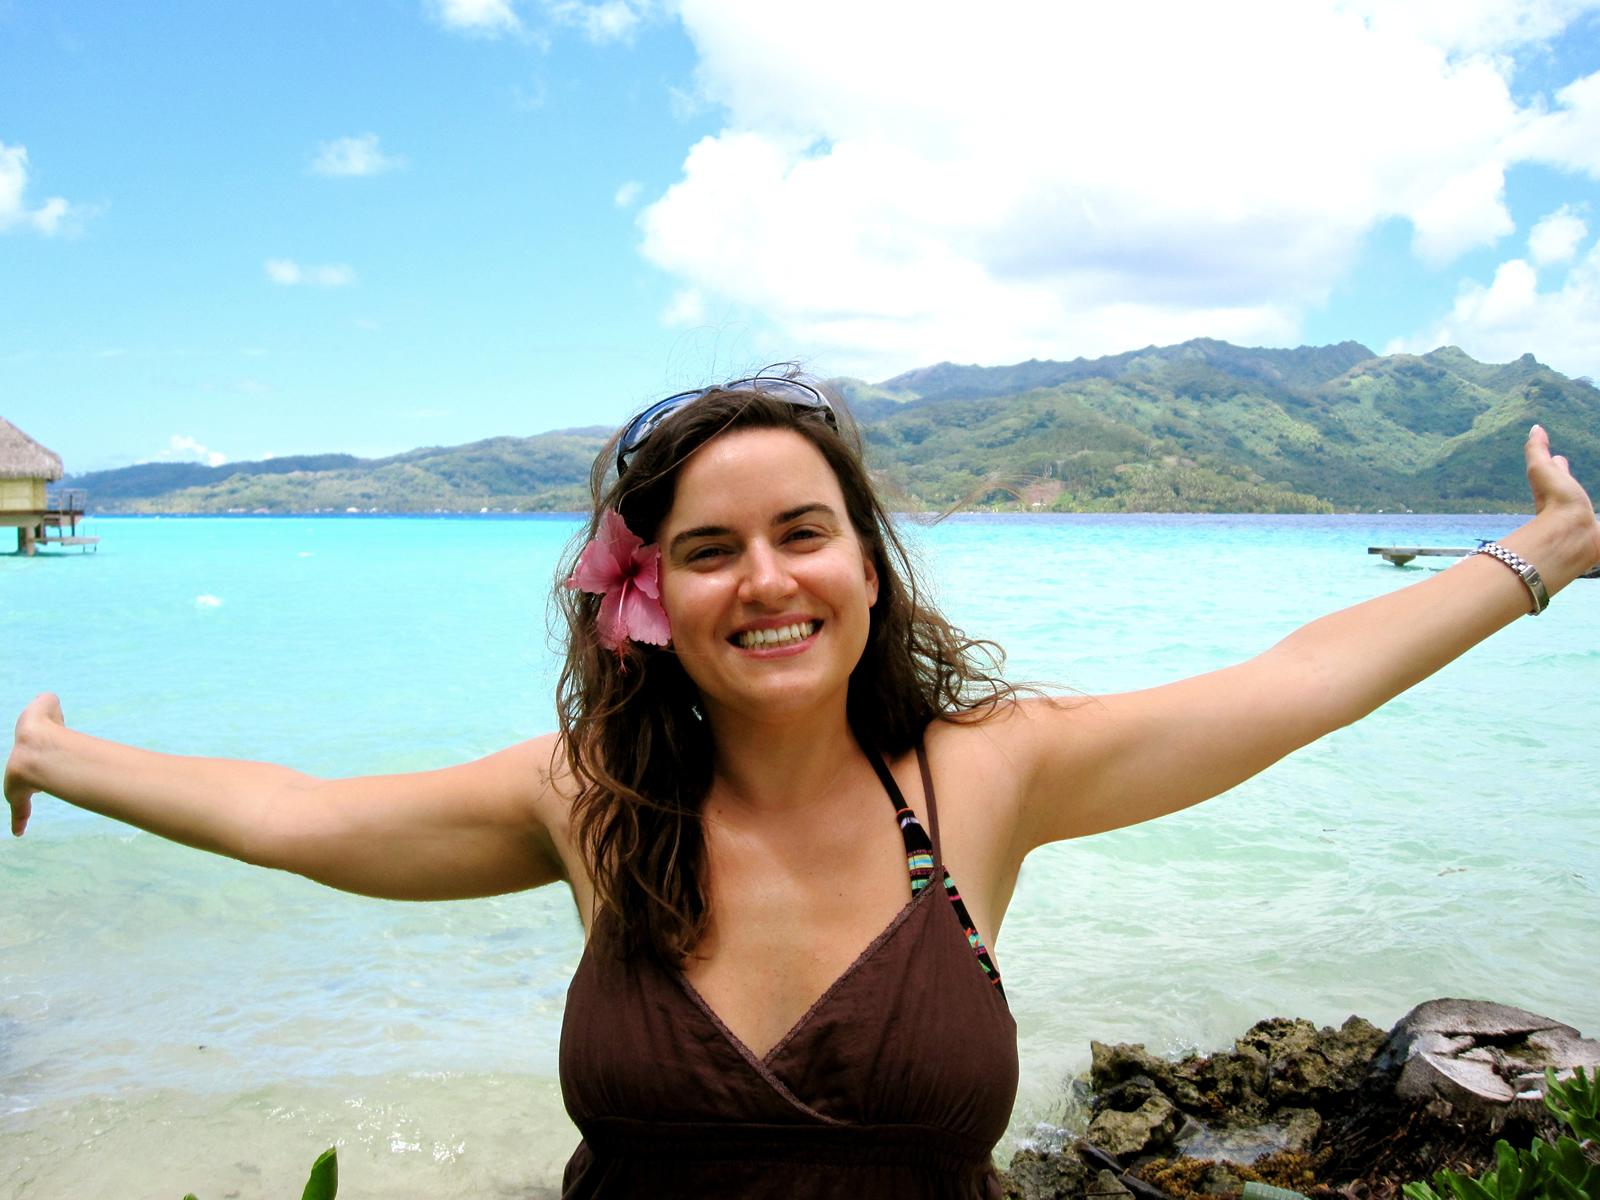 Carolyn Clarke, founder of Bambino Yoga